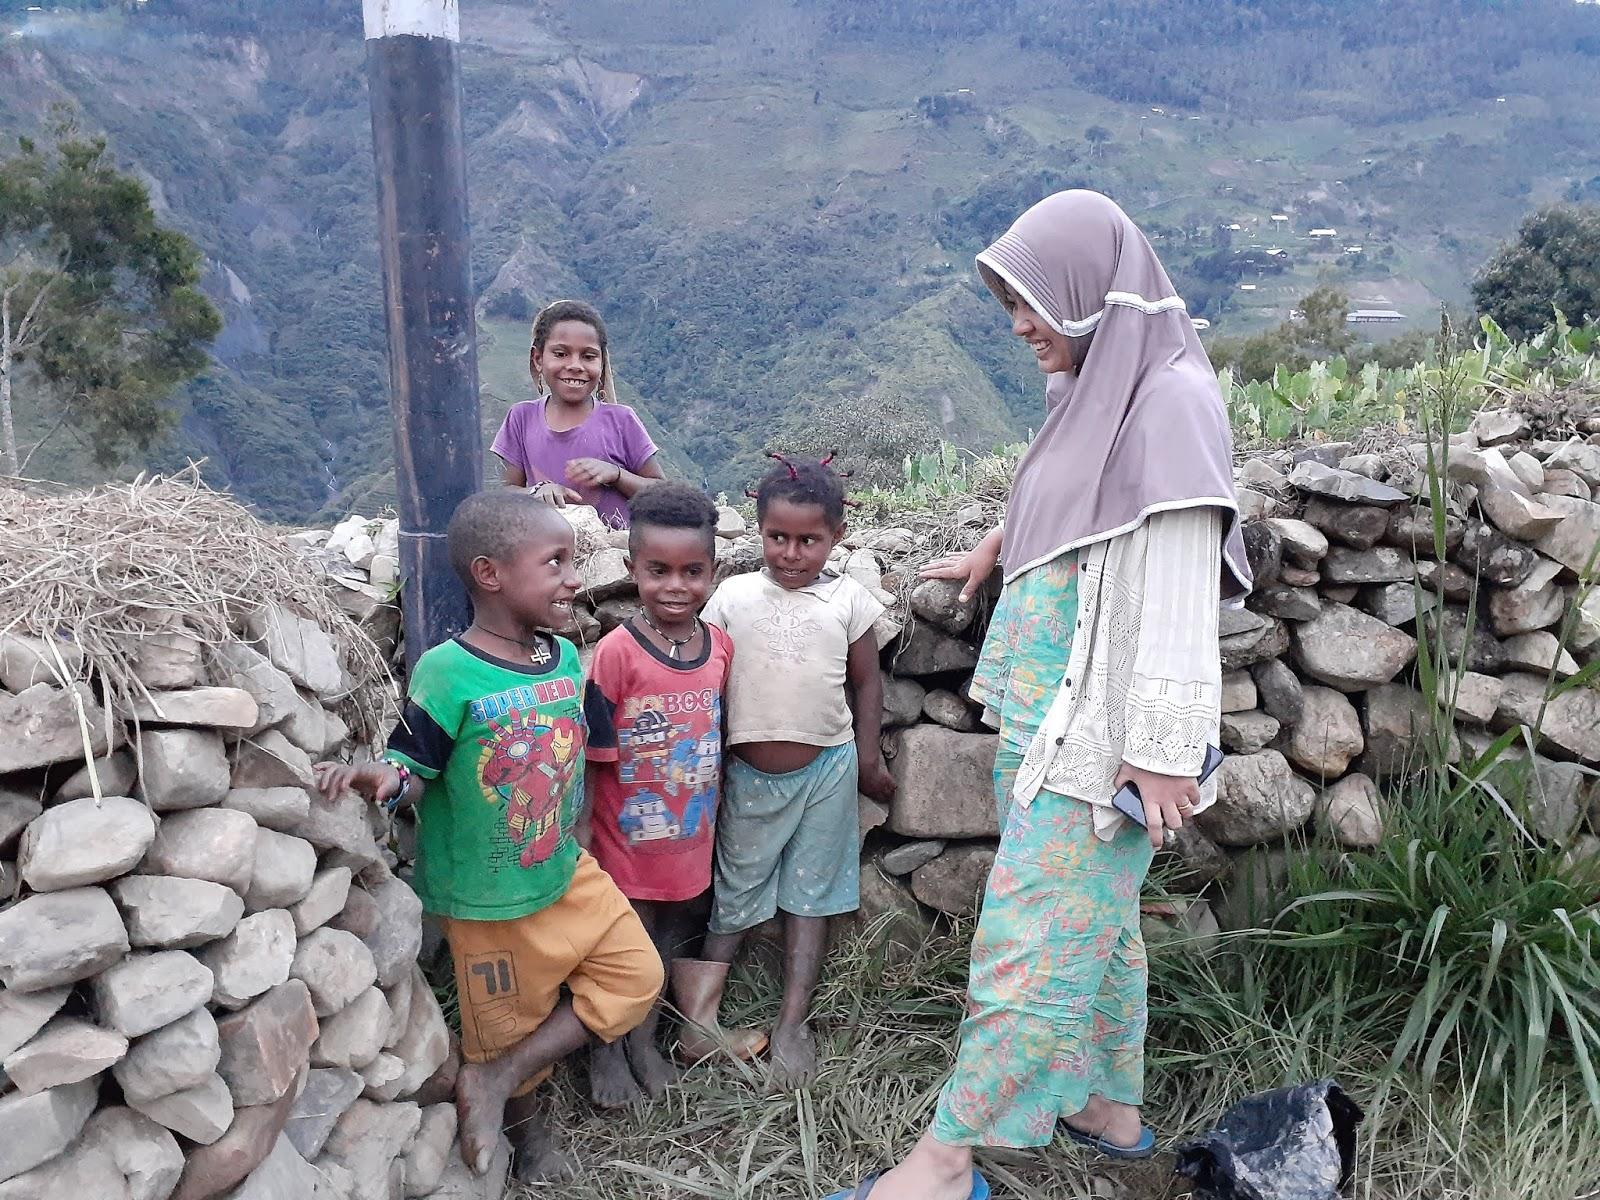 Puncak Jaya Papua, Kepingan Surga di Ujung Indonesia   Eva Riyanty ...